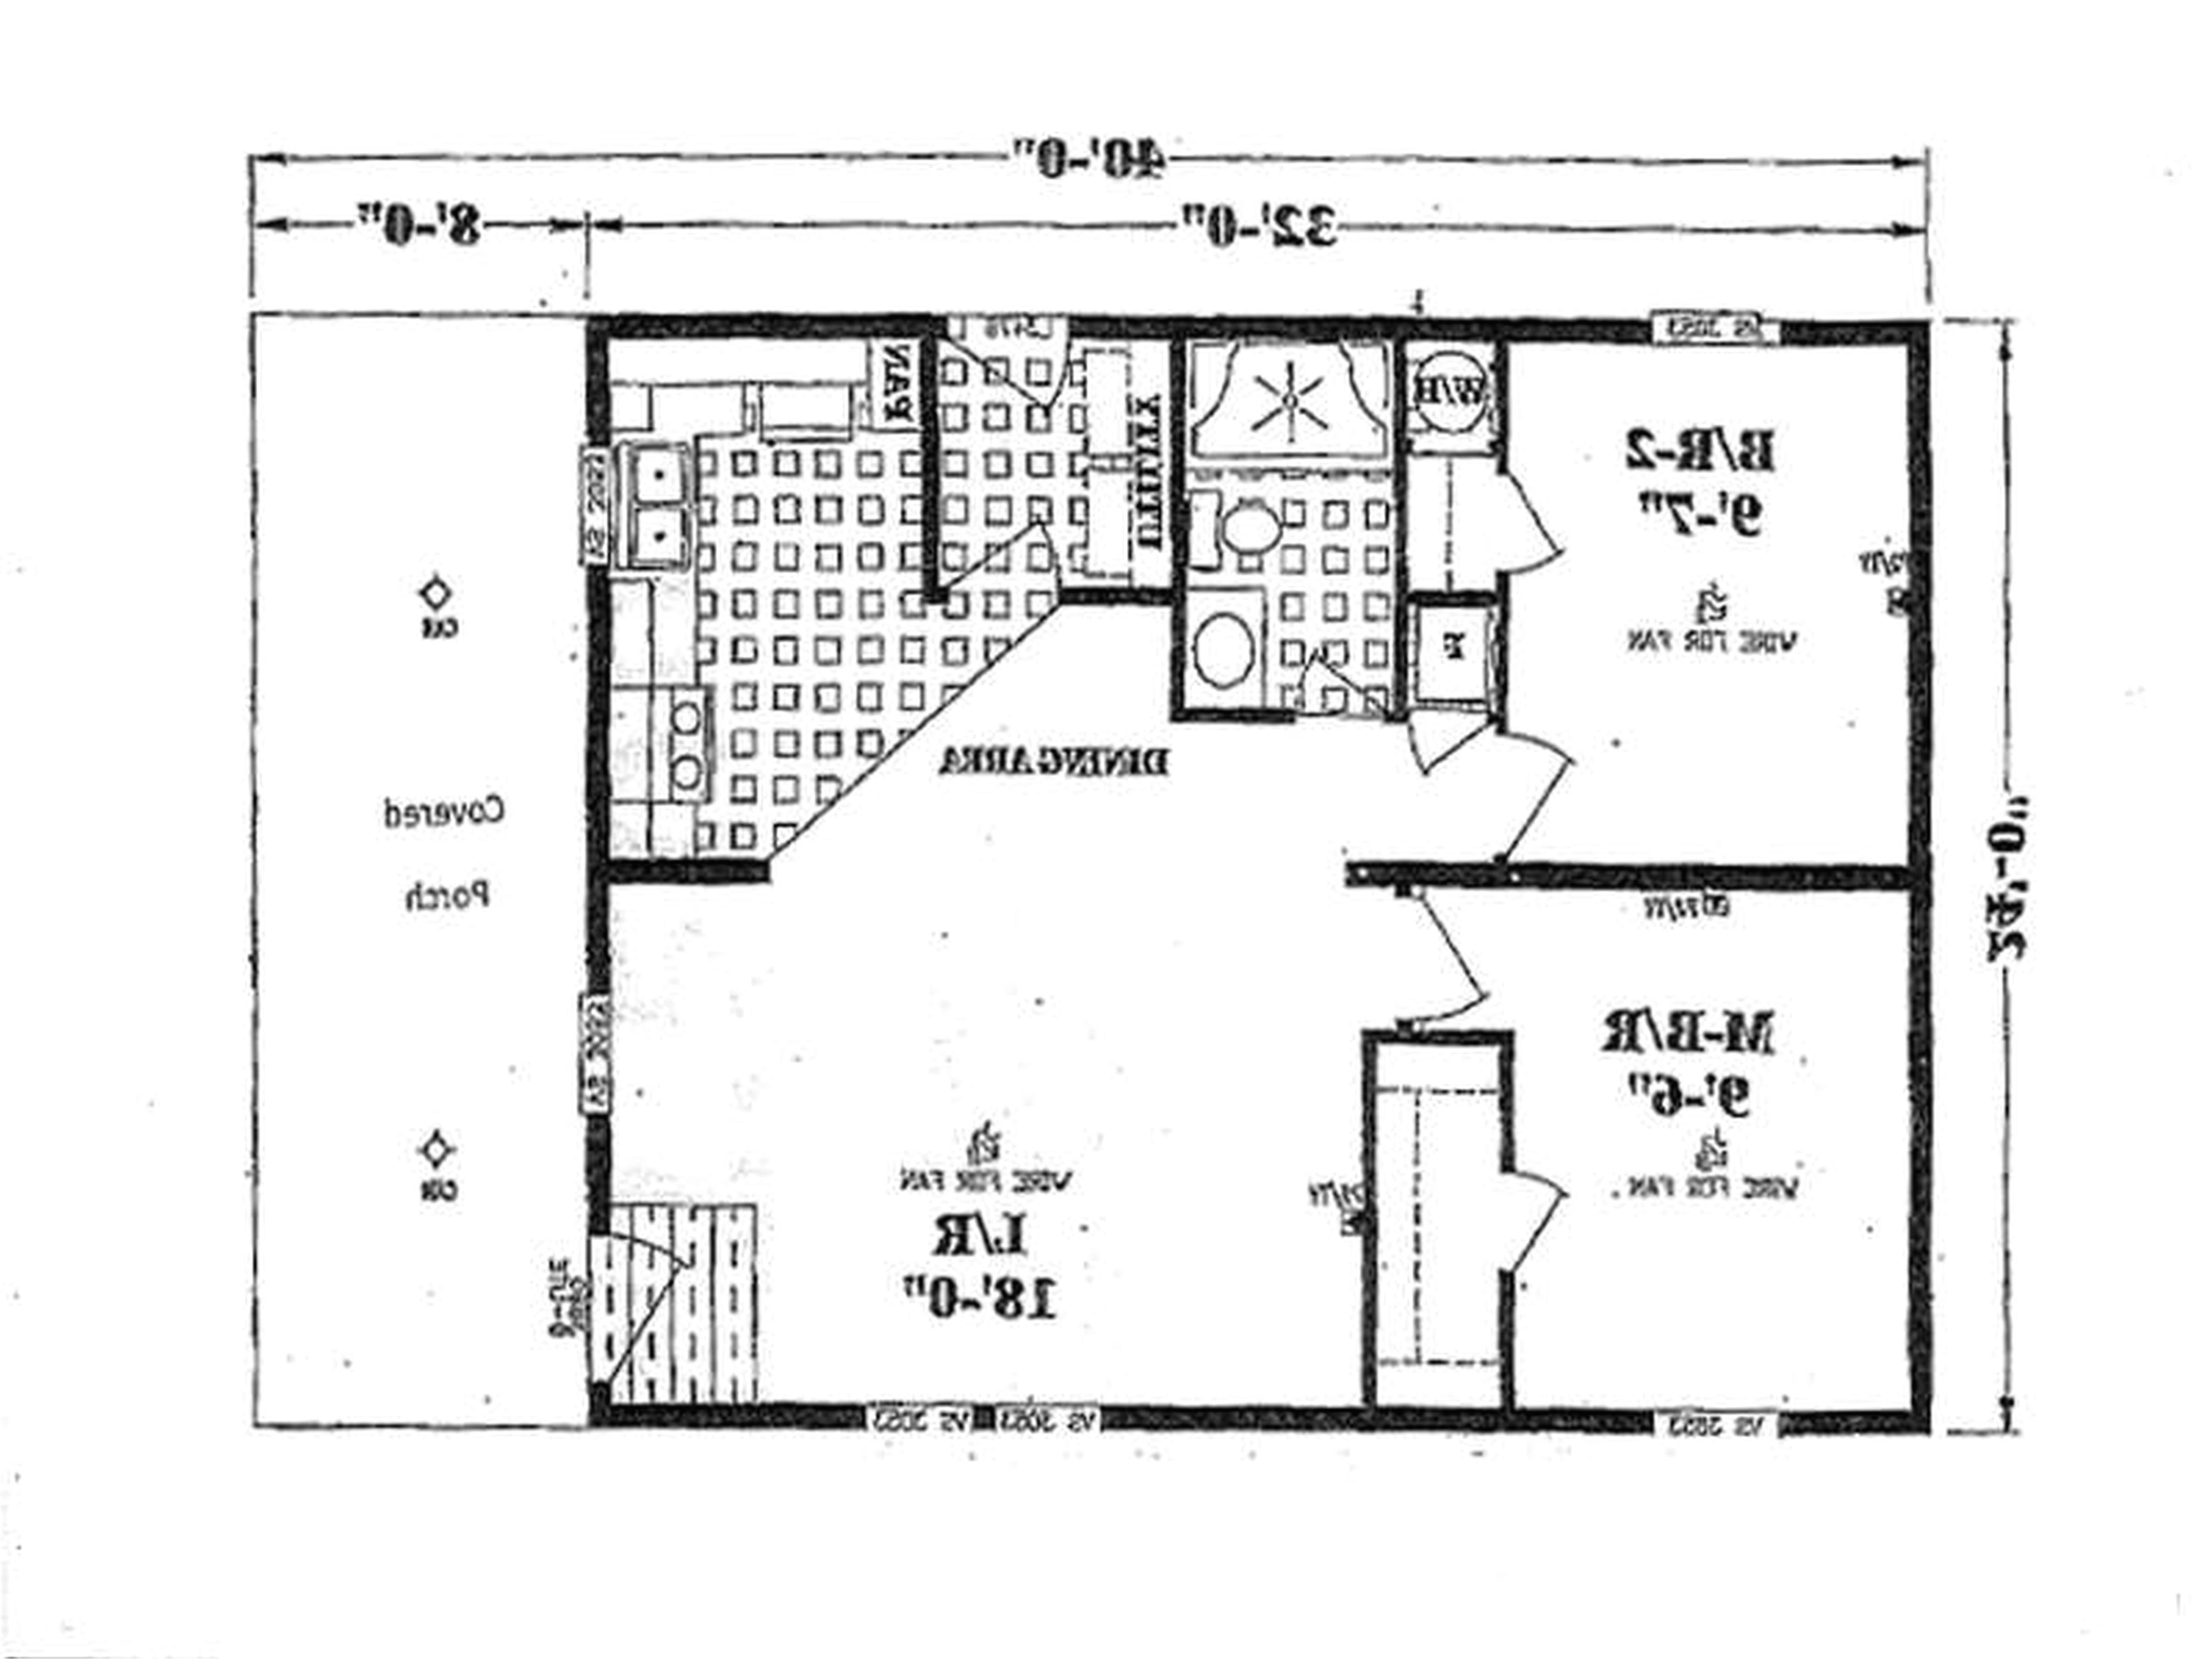 1 bedroom mobile homes floor plans netintellects pertaining to best small mobile homes floor plans